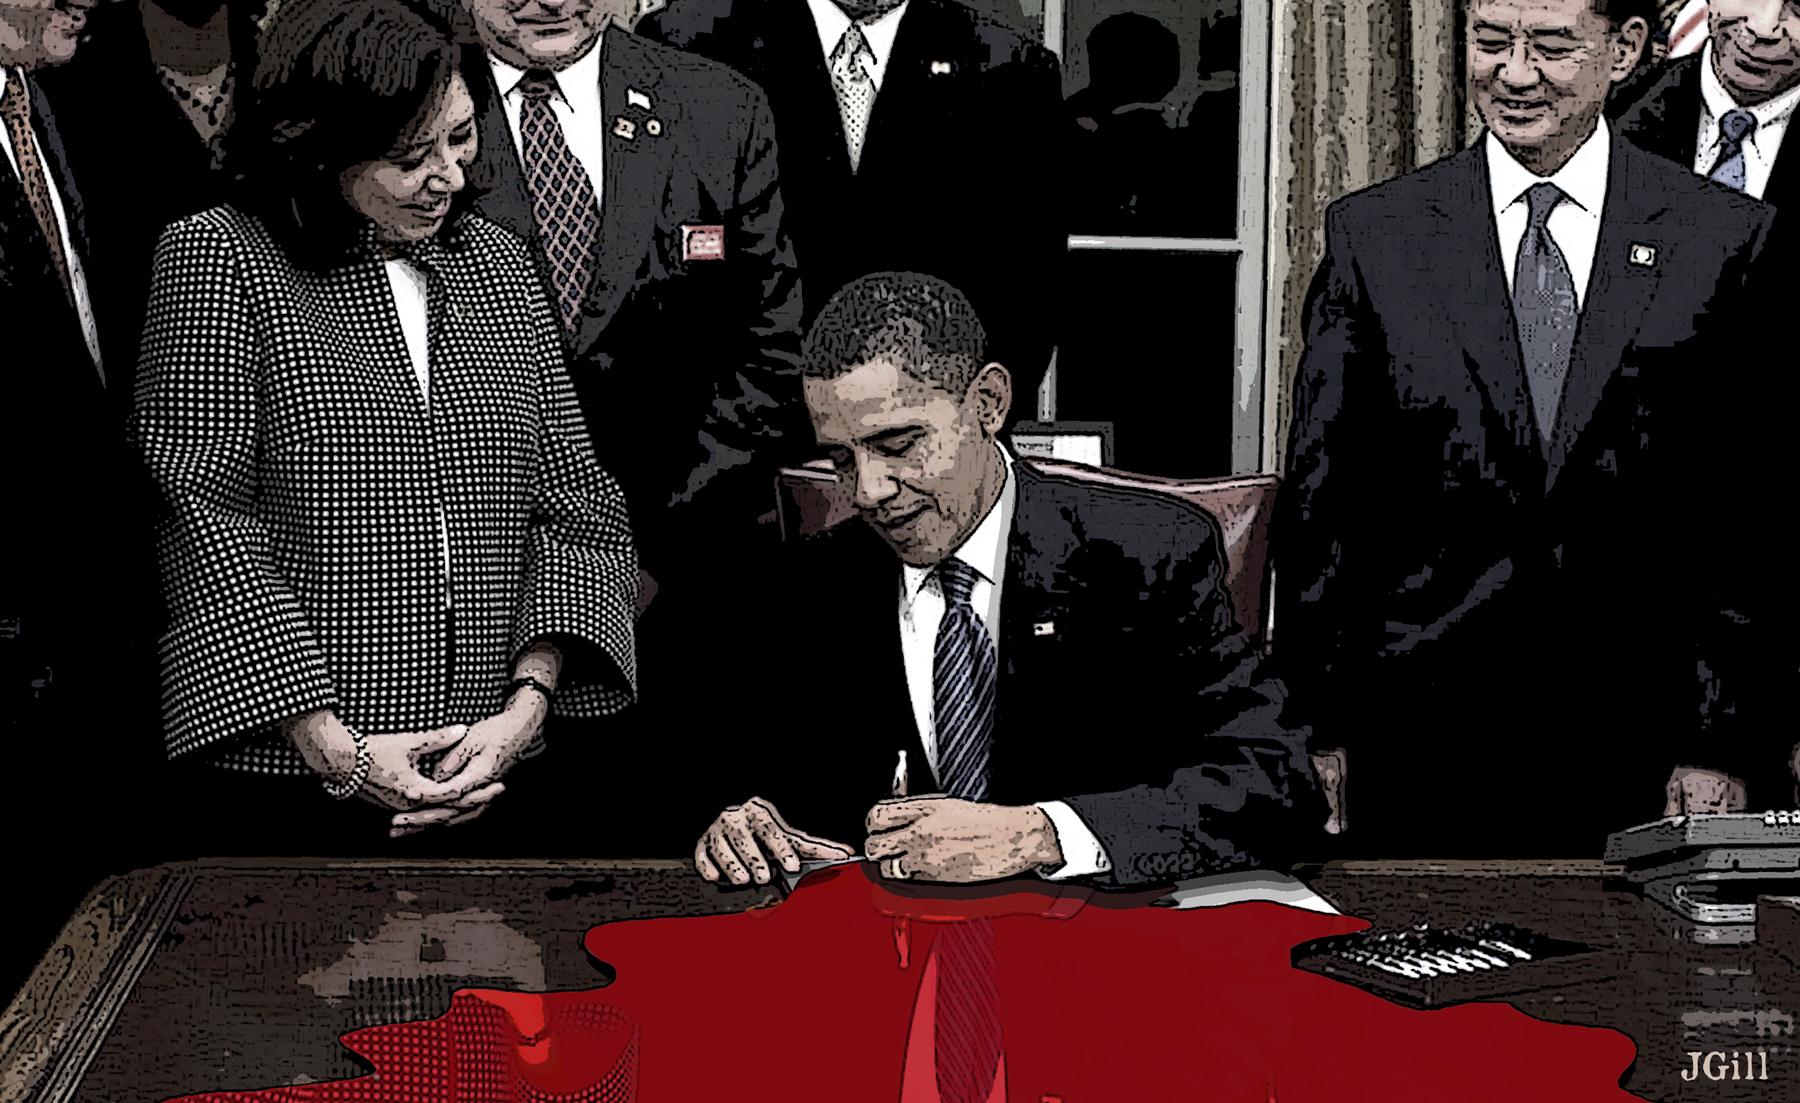 Veterans and the political class, Obama, military, collage, photomontage, http://cognitivebiasparade.prosite.com/, Paul Jacob, political, politics, blood